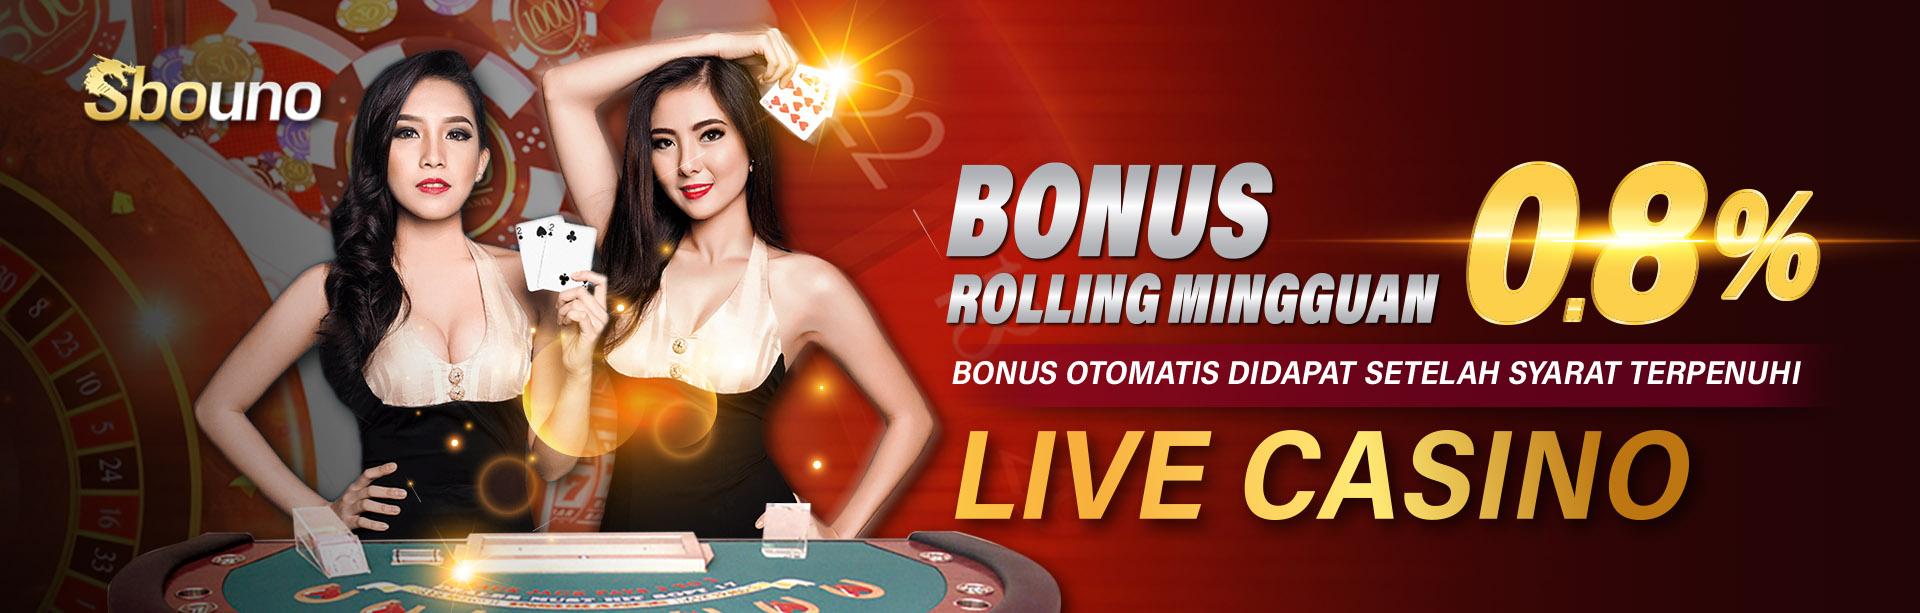 Rolingan casino